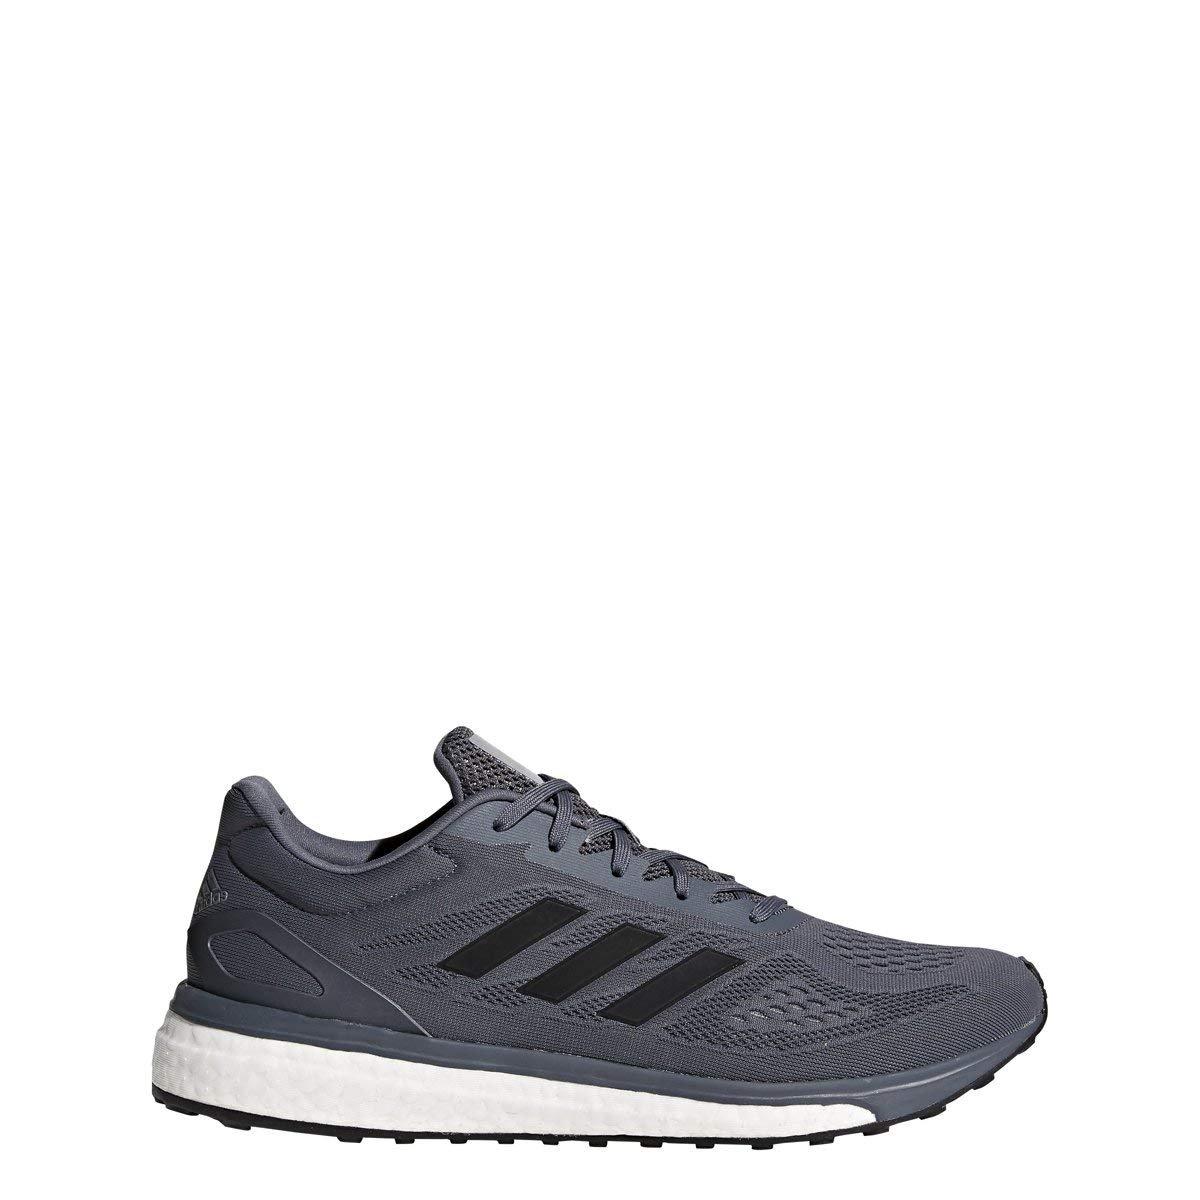 adidas response auftrieb auftrieb response lt mens laufschuh 7e9b10